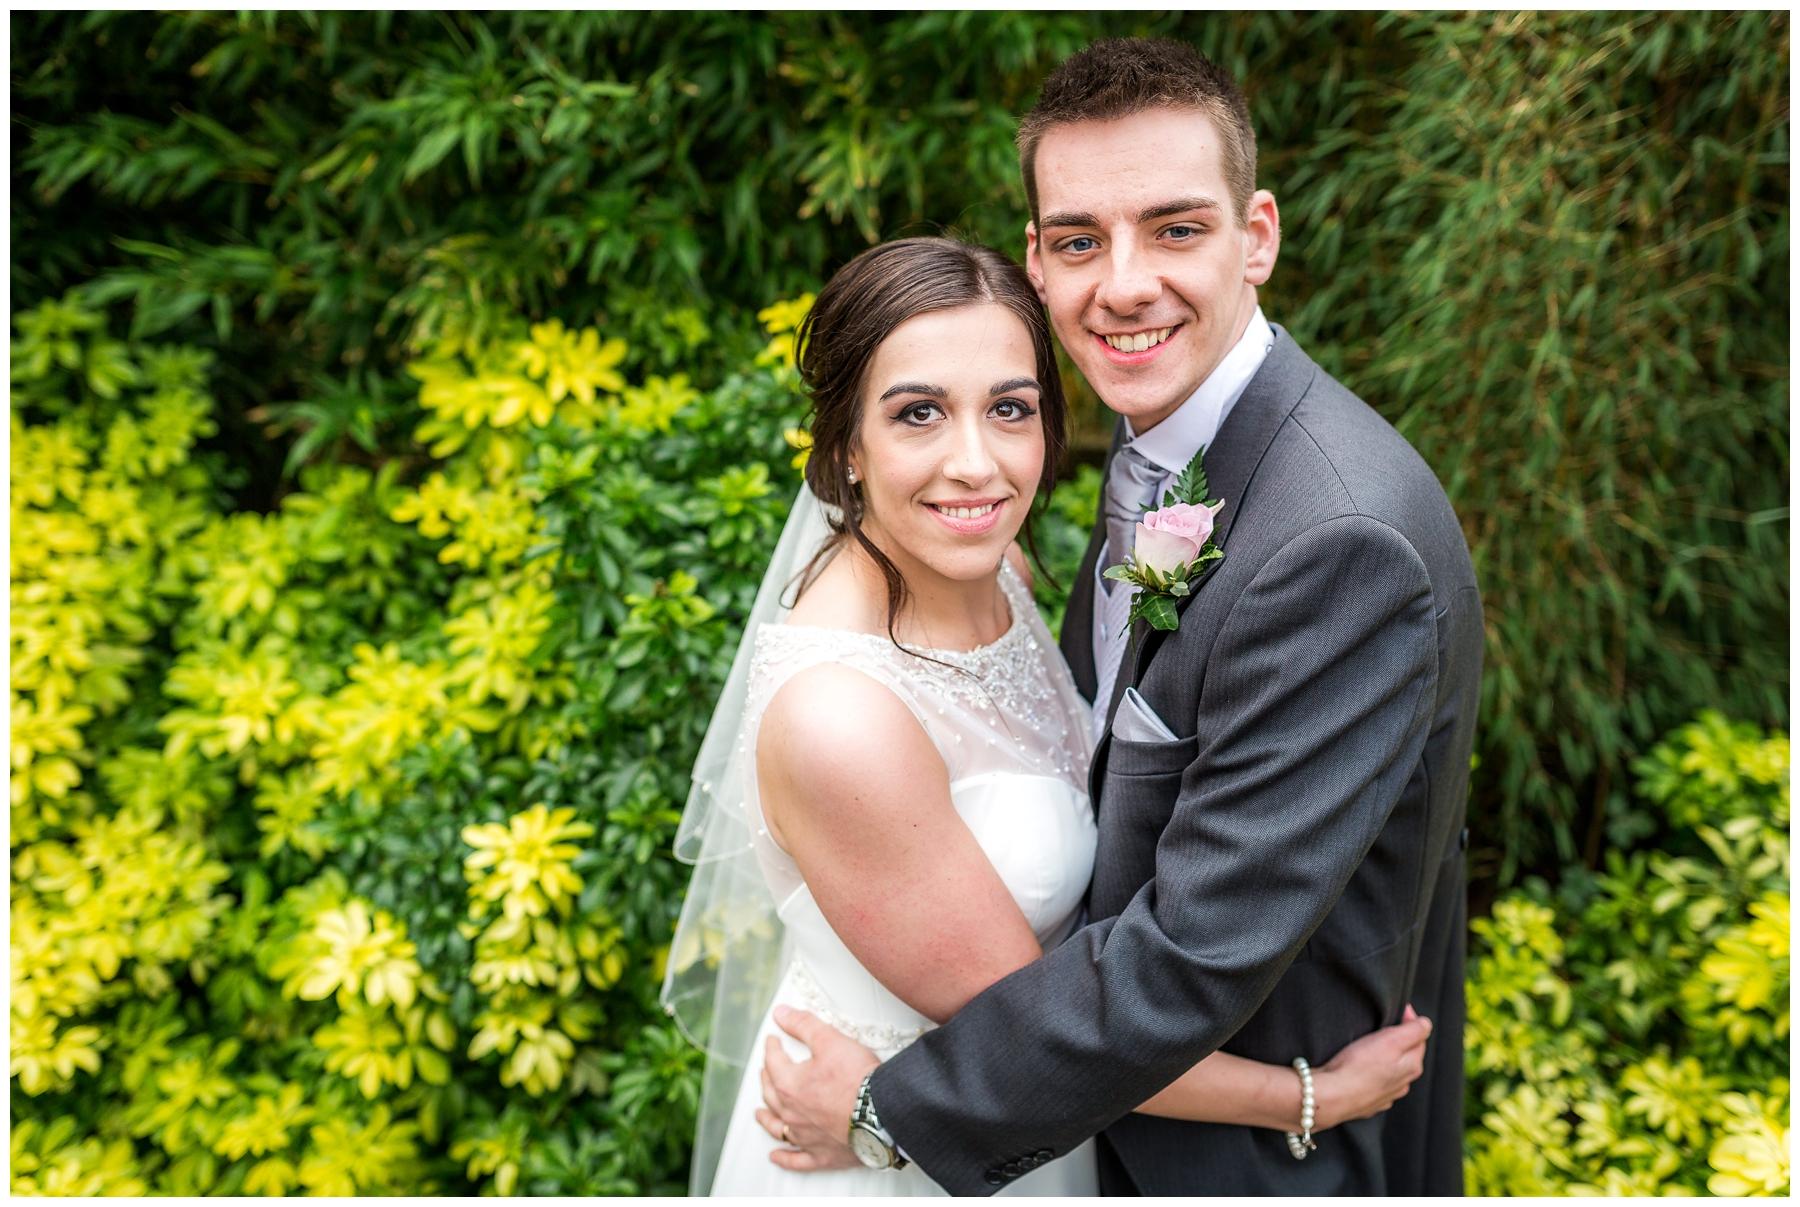 holland-hall-wedding-photography-becky-jason_0033.jpg